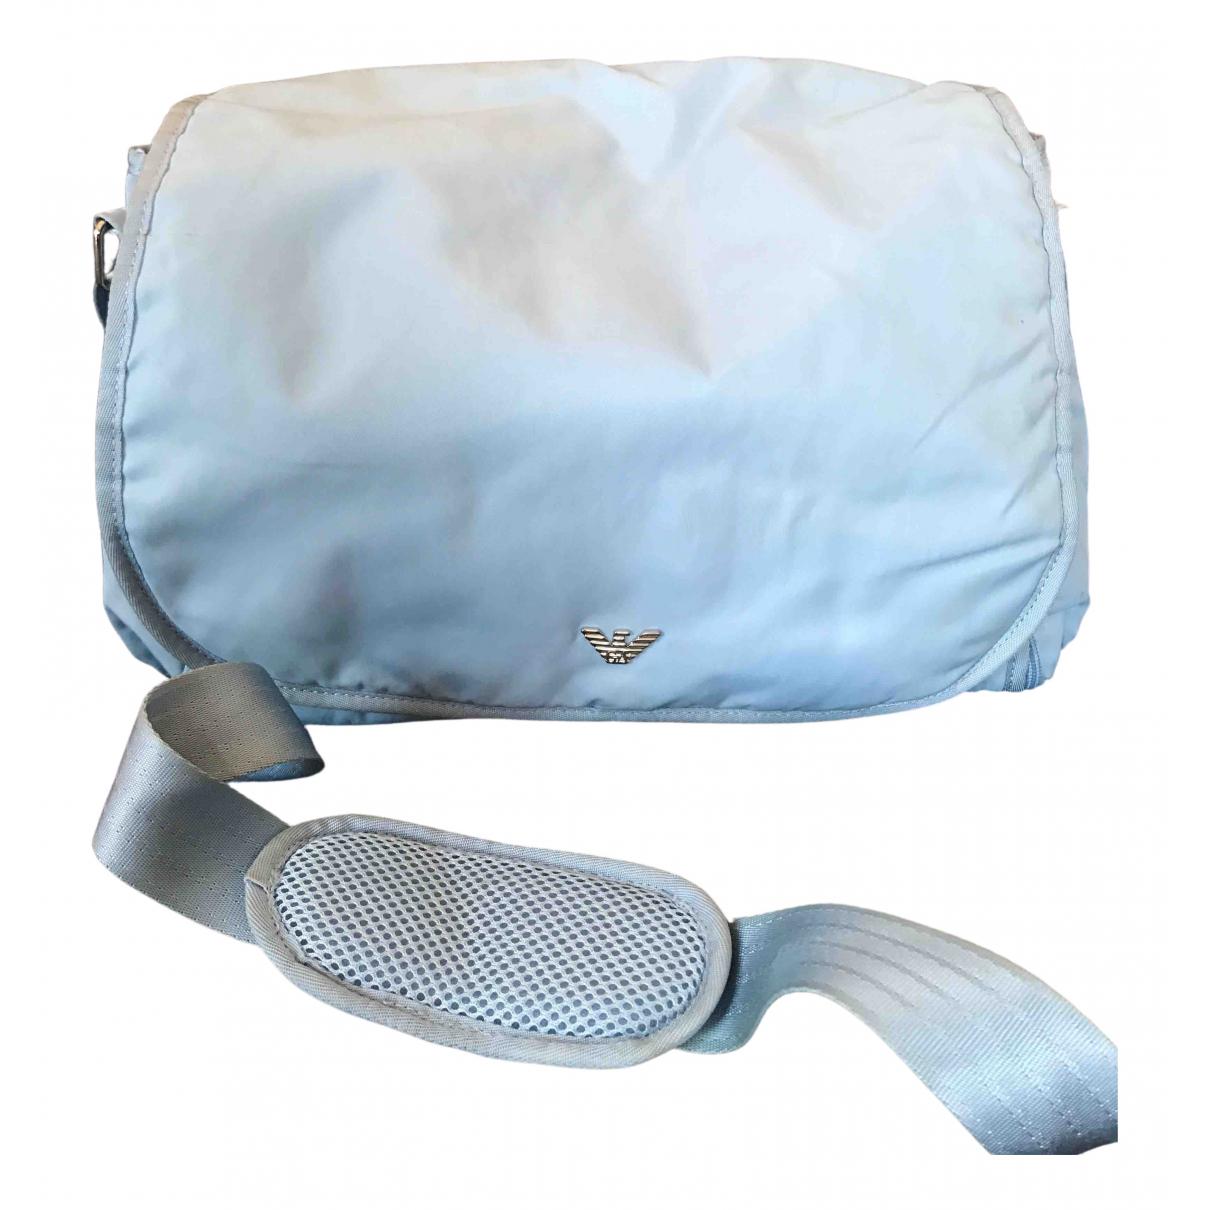 Armani Baby - Sac   pour enfant en coton